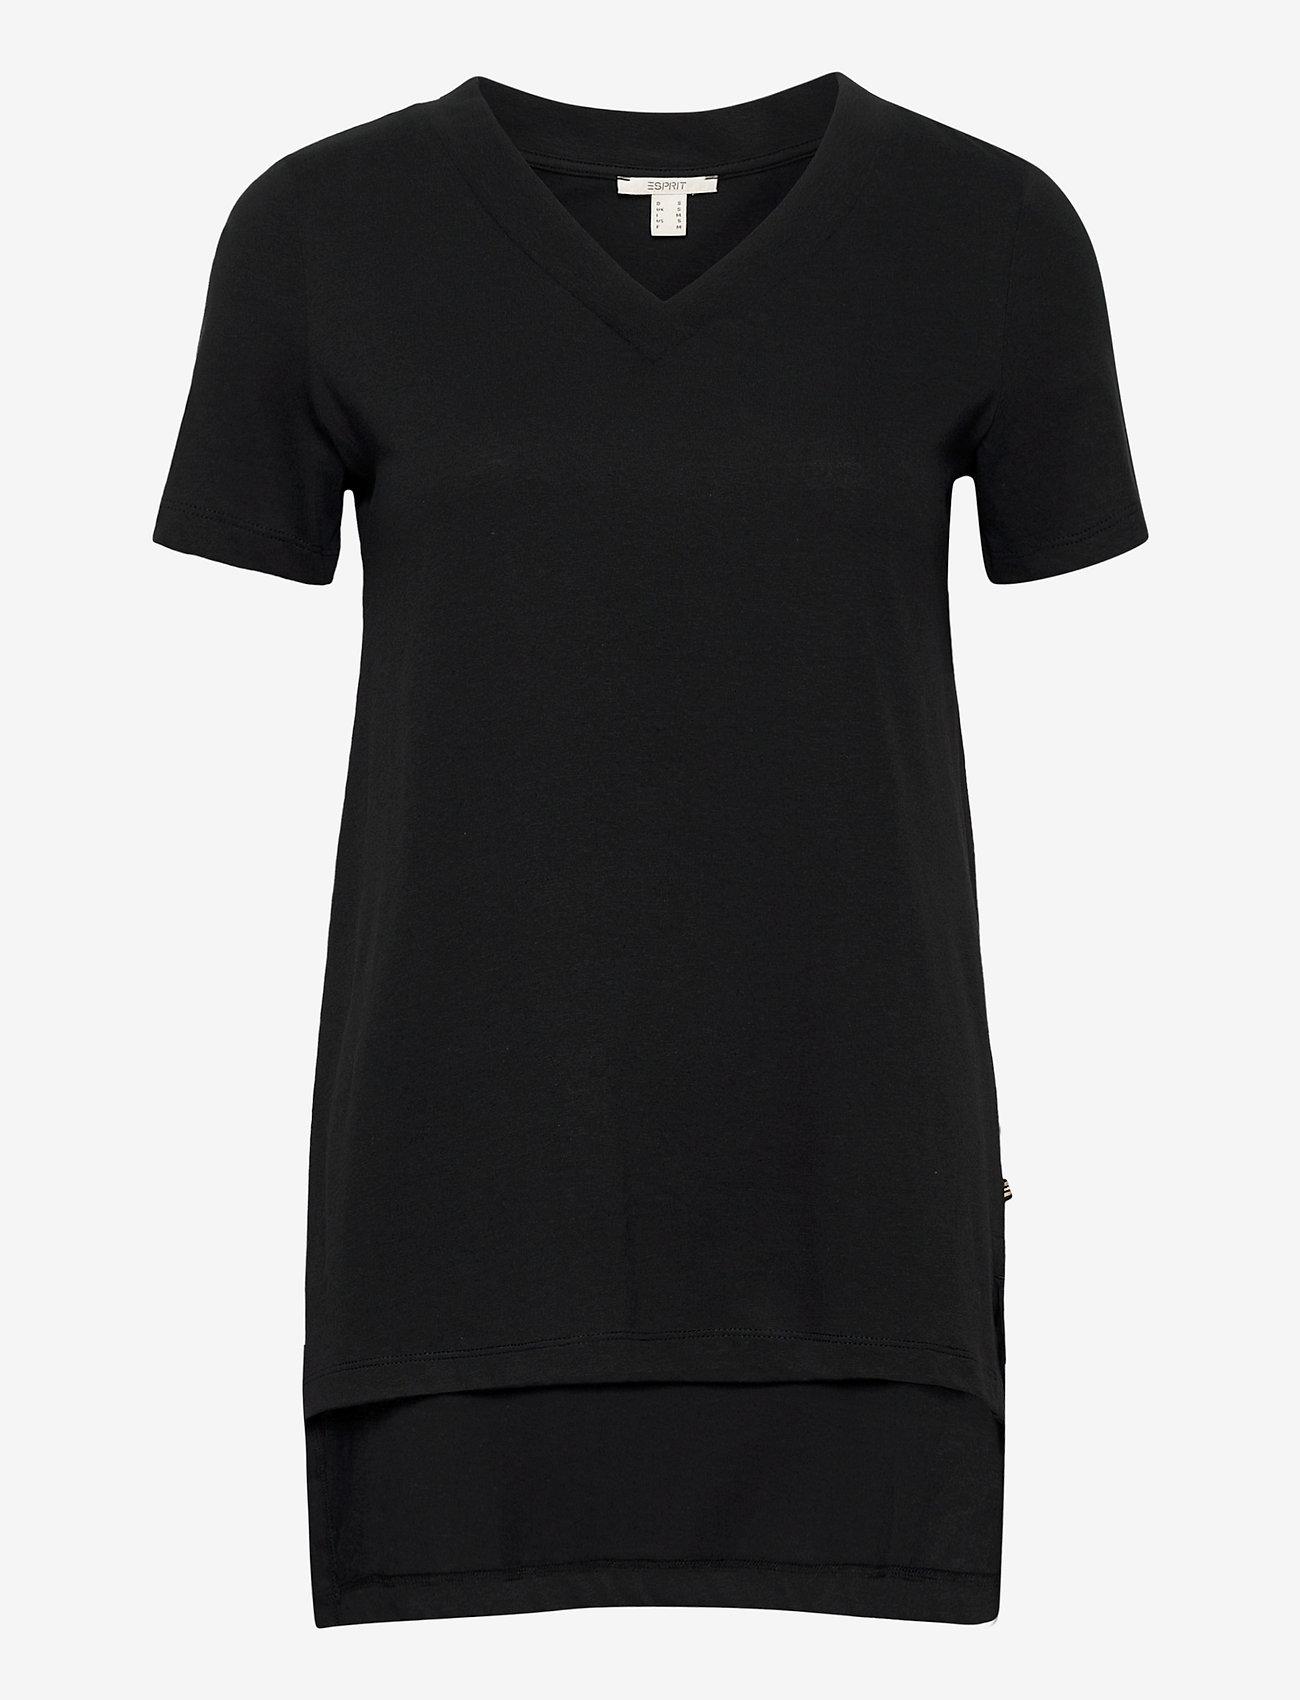 Esprit Casual - T-Shirts - t-shirts - black - 0